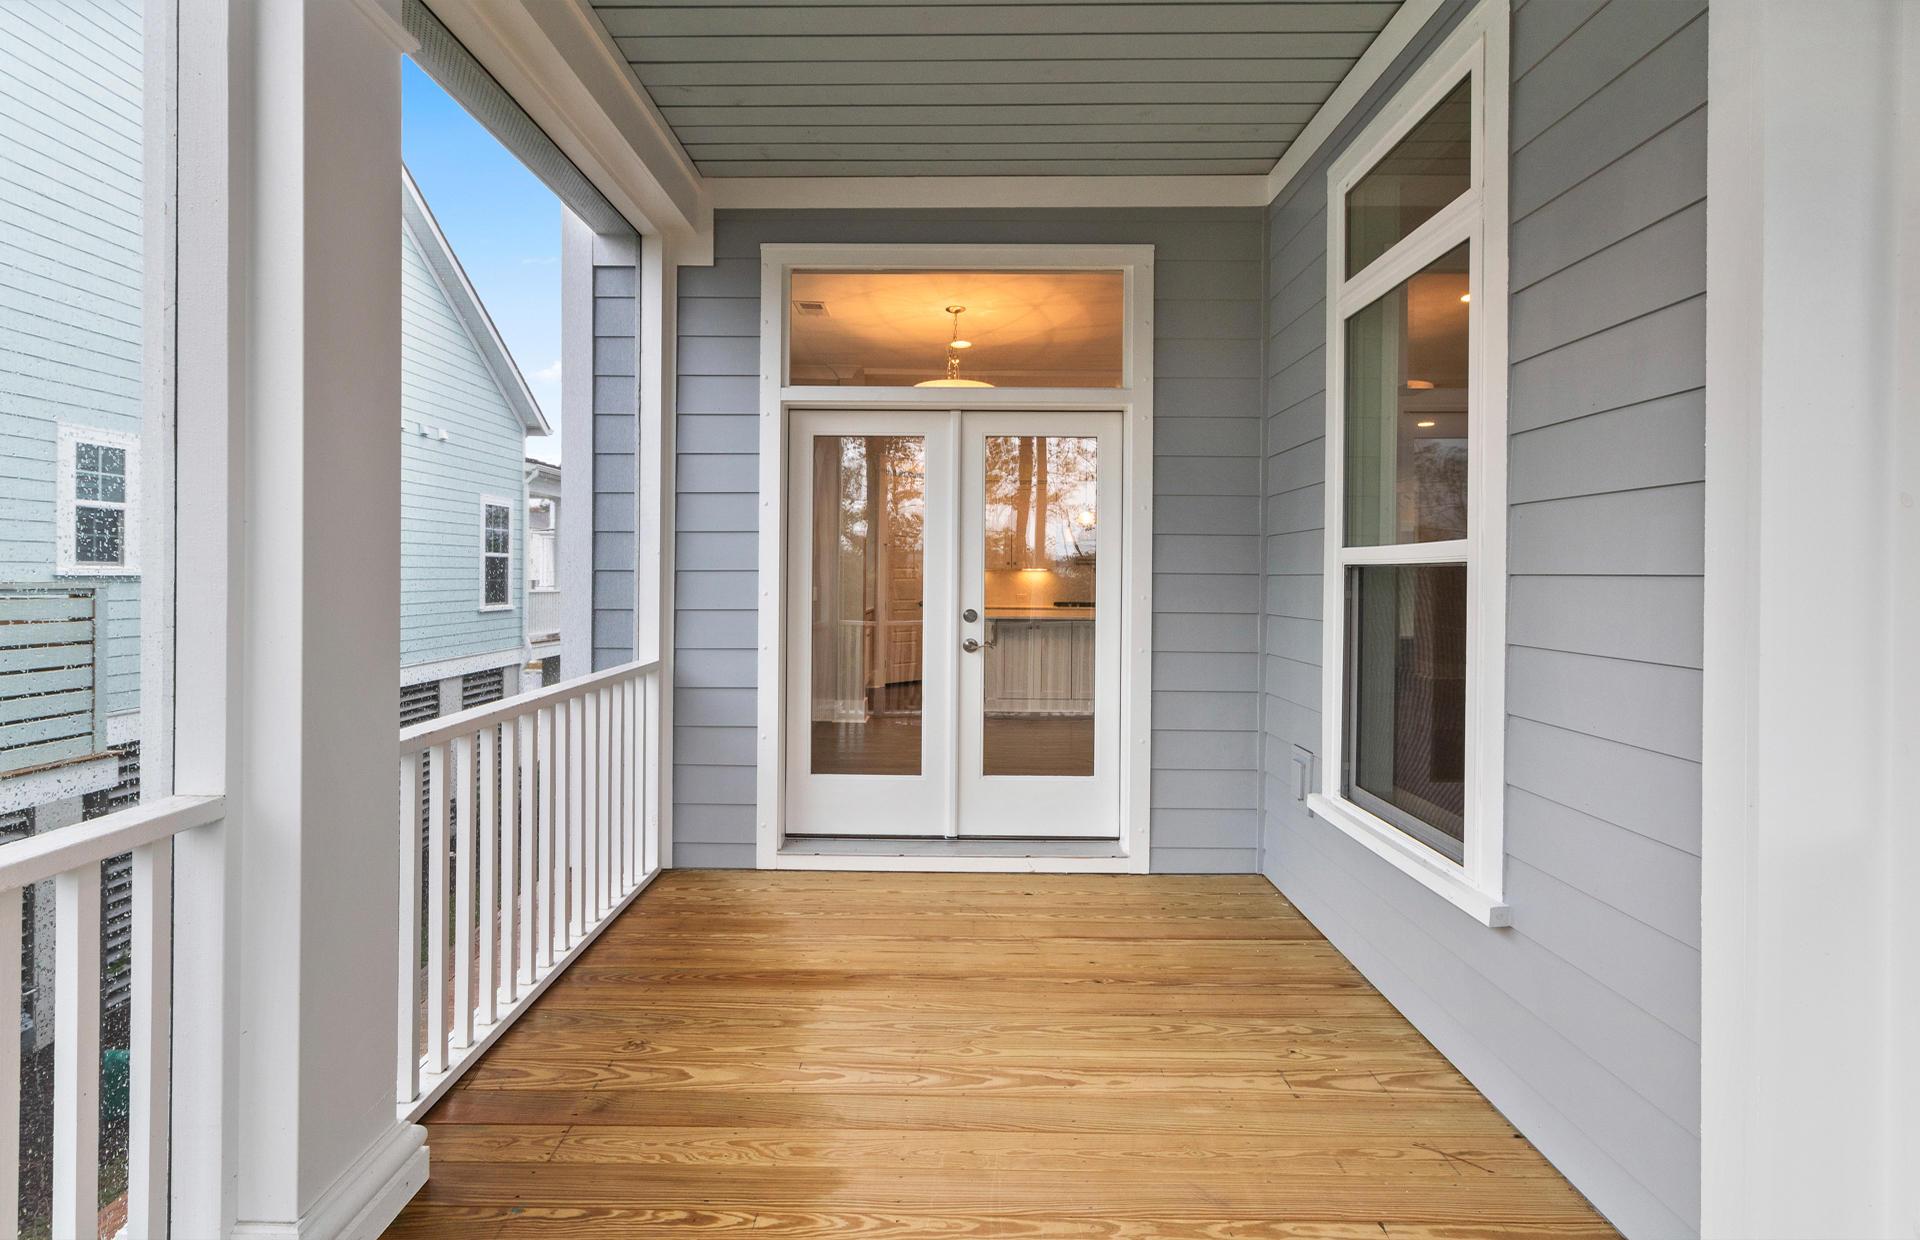 Dunes West Homes For Sale - 2320 Bucktail, Mount Pleasant, SC - 13